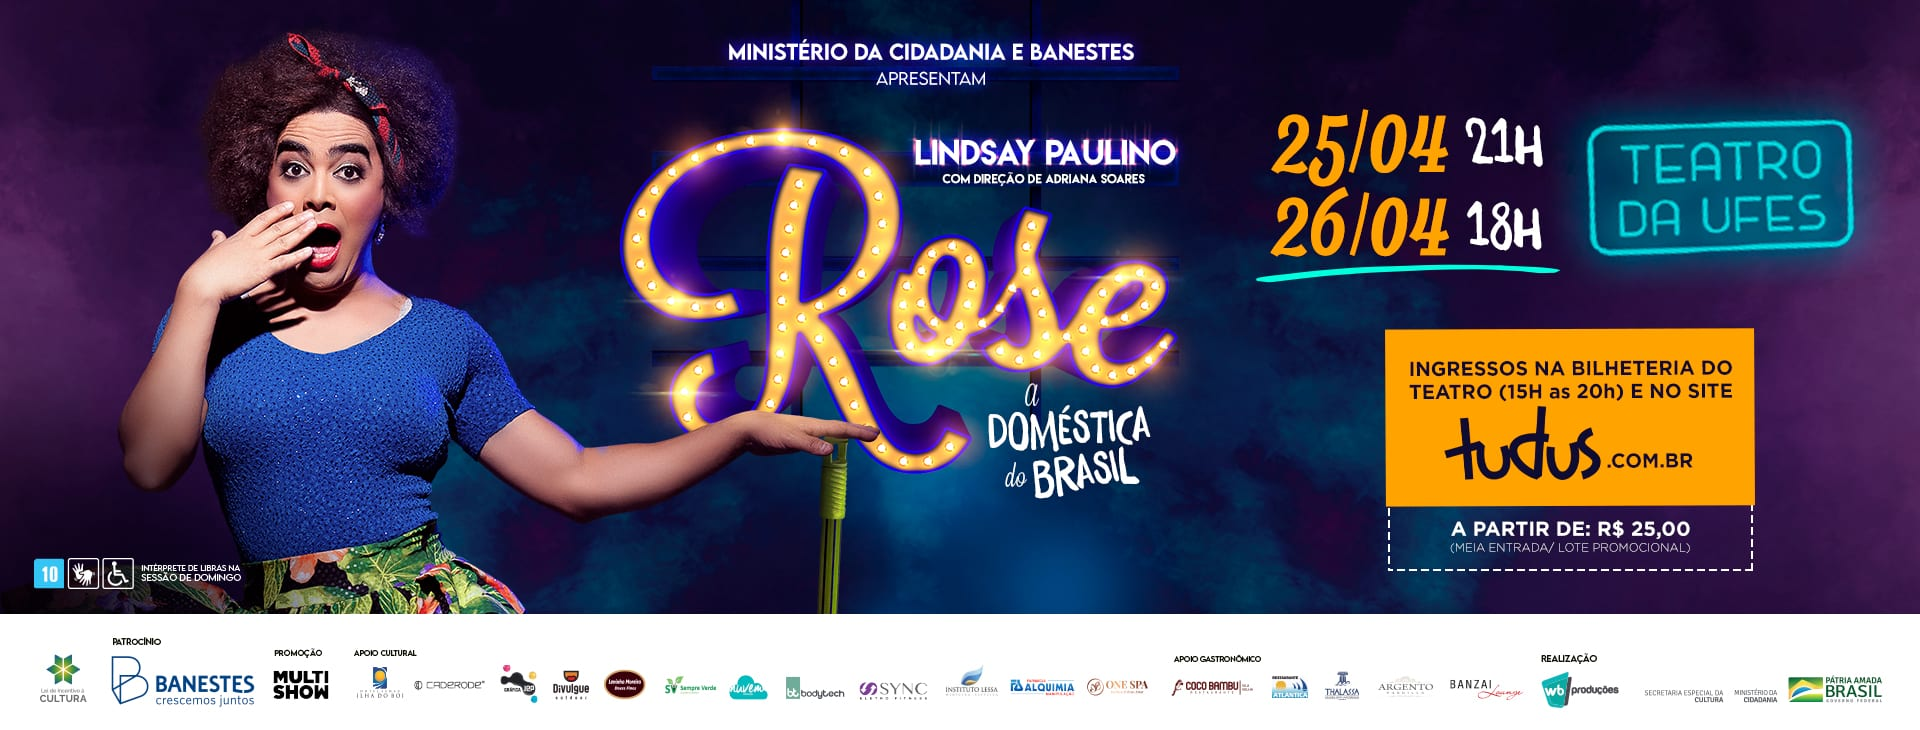 rose_a_domestica_do_brasil_banner_site_wb_1920_730px_v03